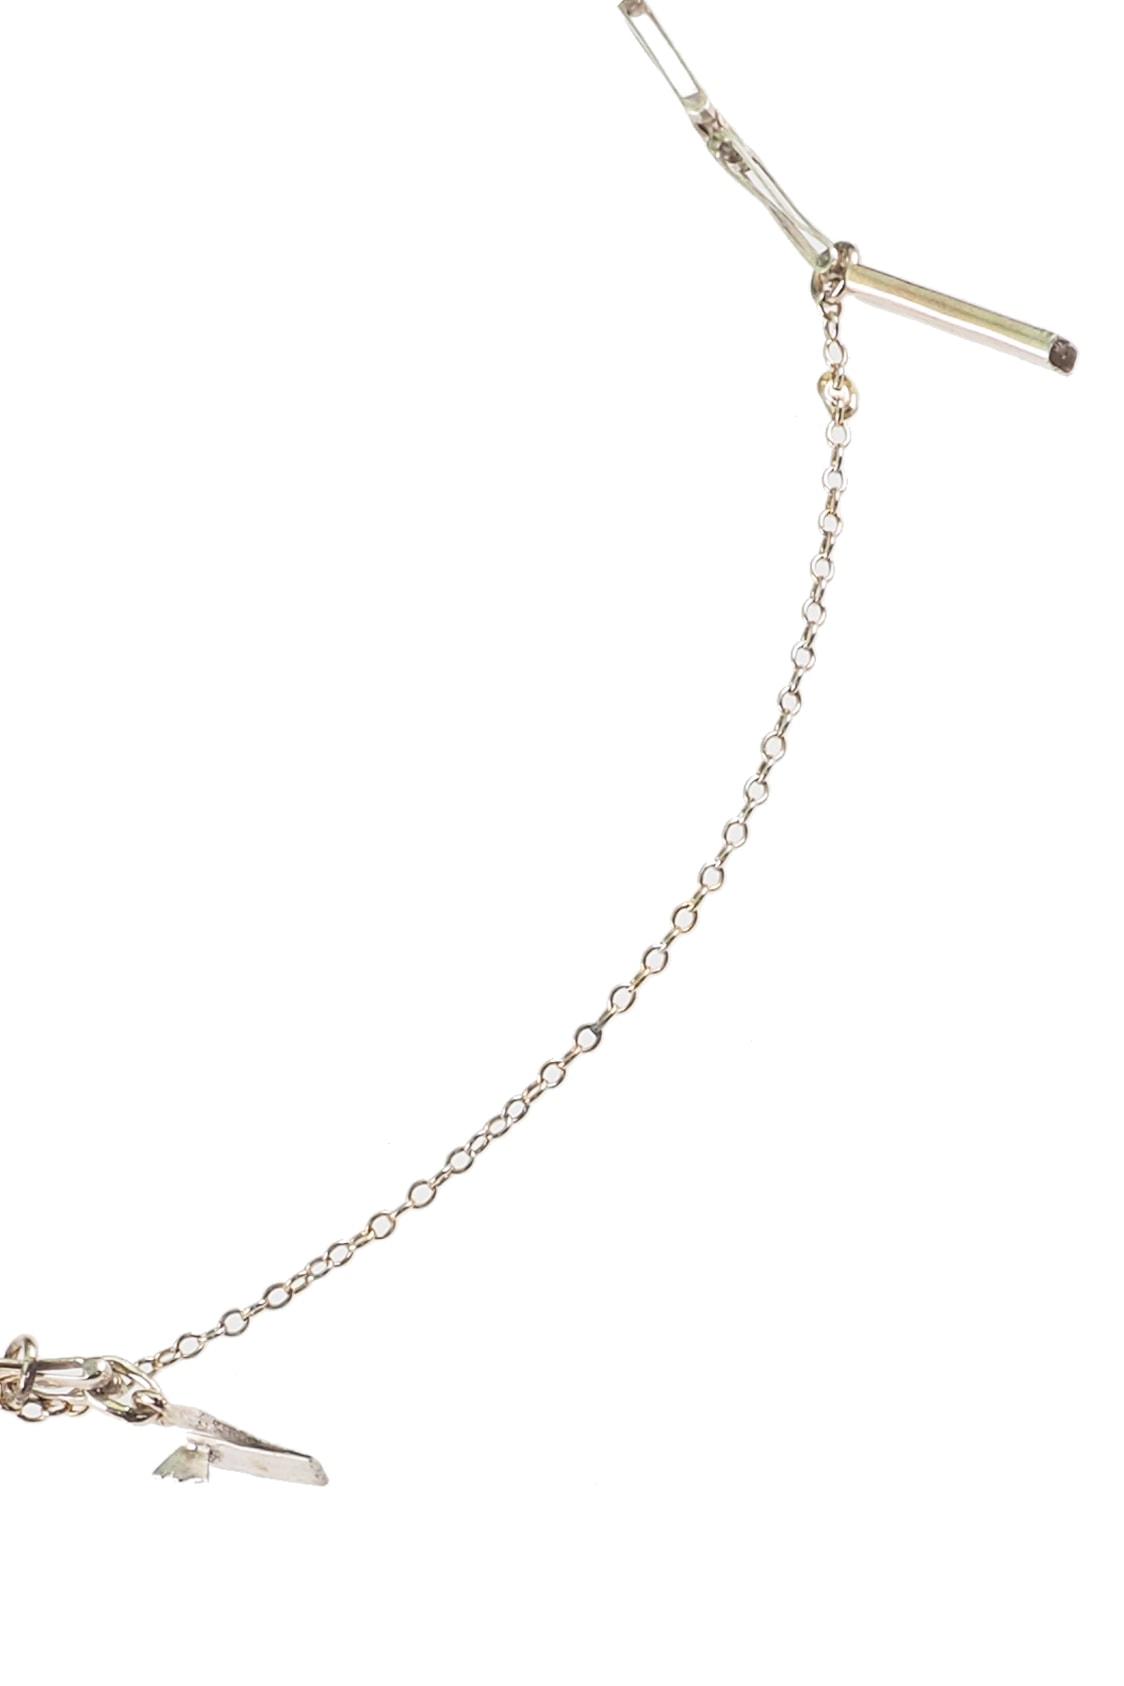 antikschmuck-armband-1521-c